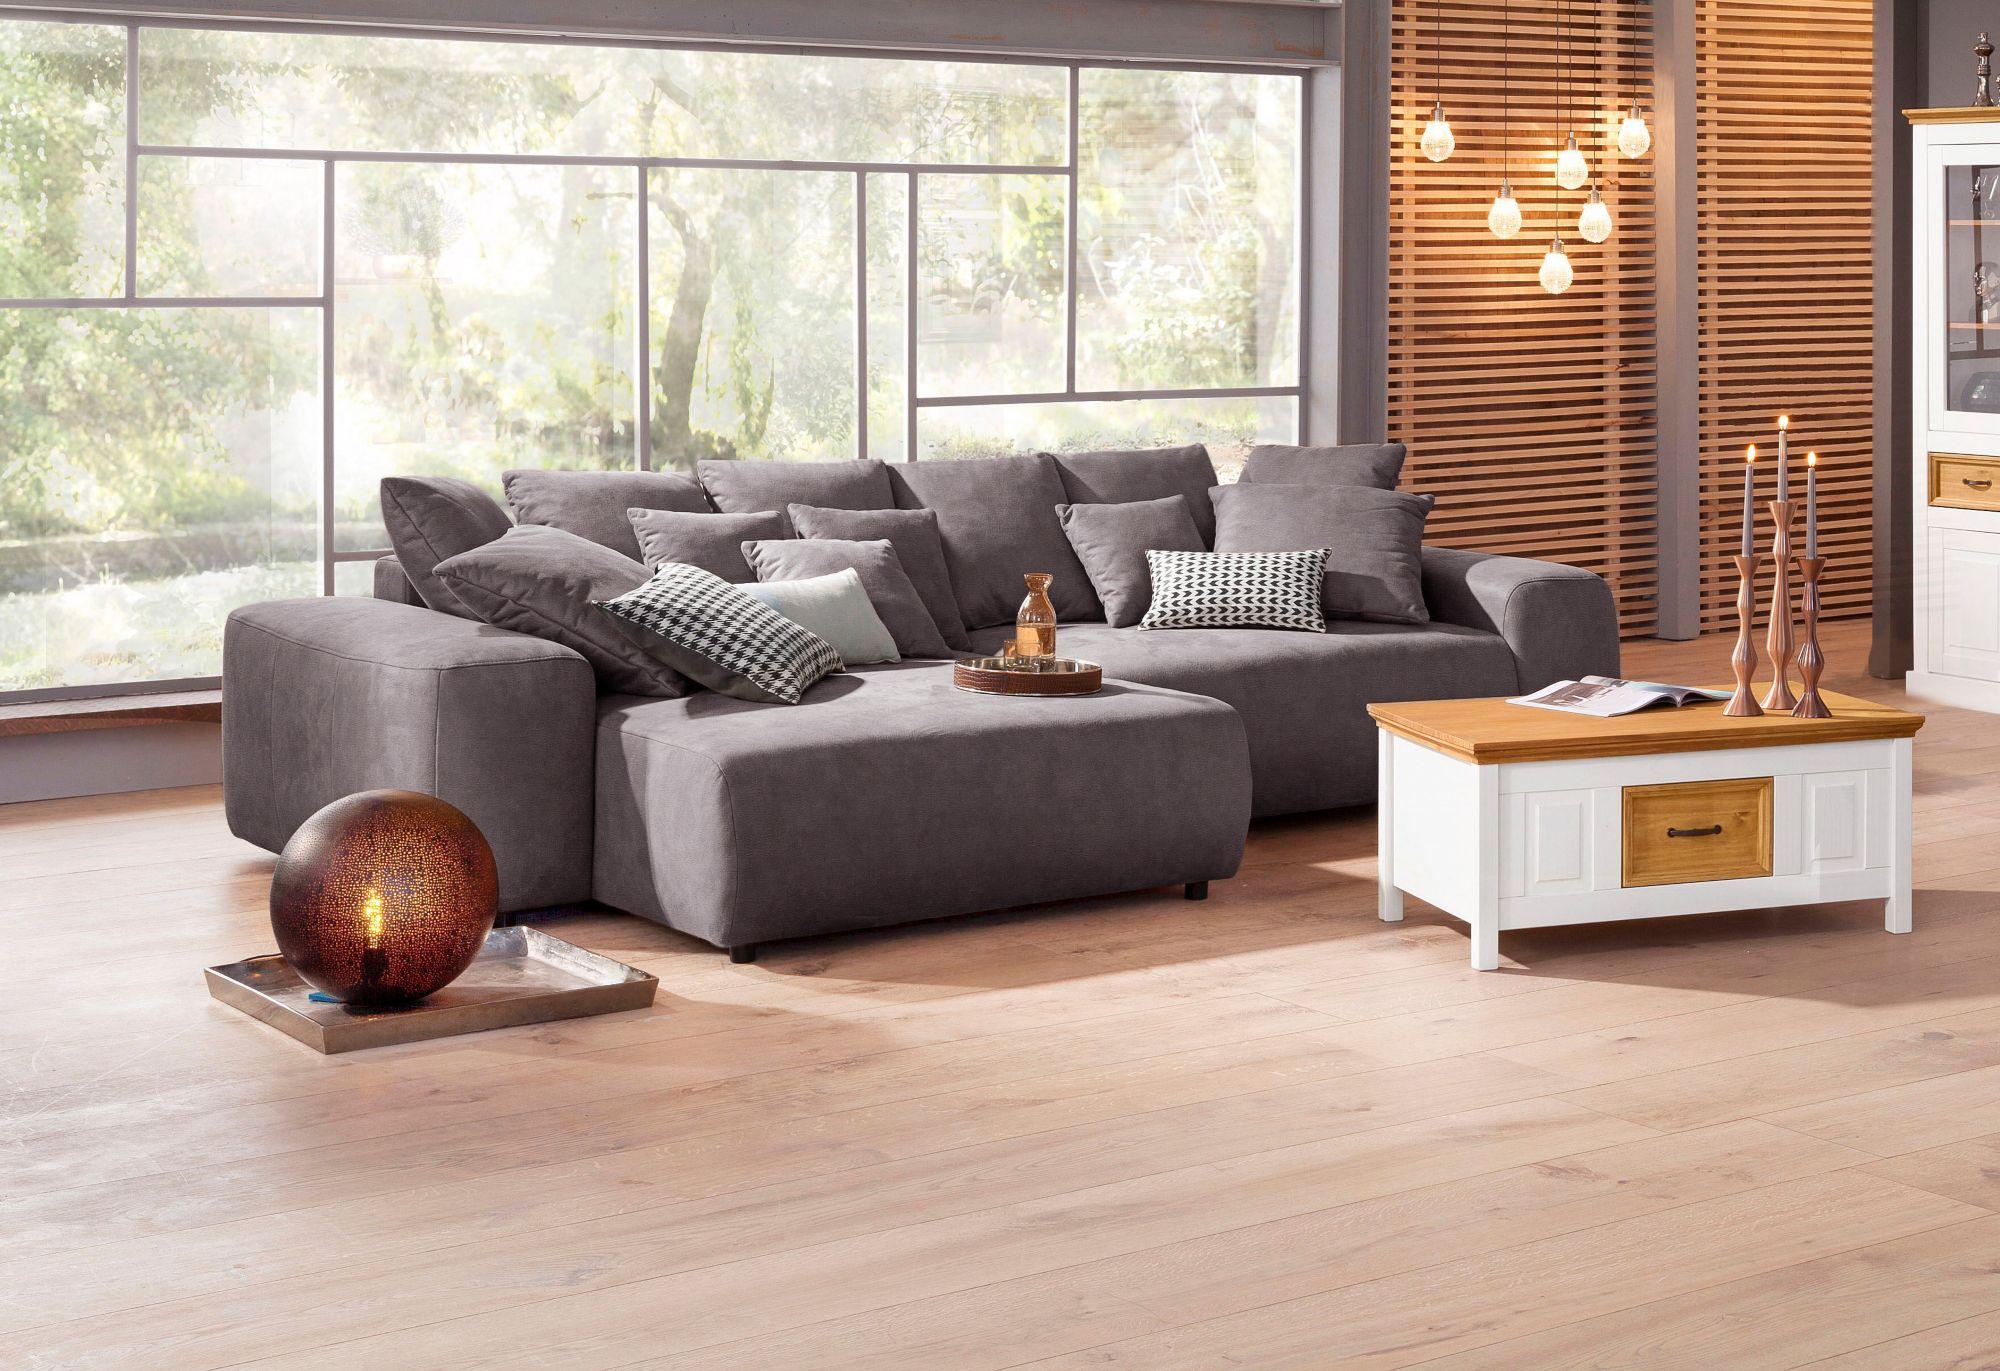 home affaire ecksofa glamour boxspringfederung. Black Bedroom Furniture Sets. Home Design Ideas